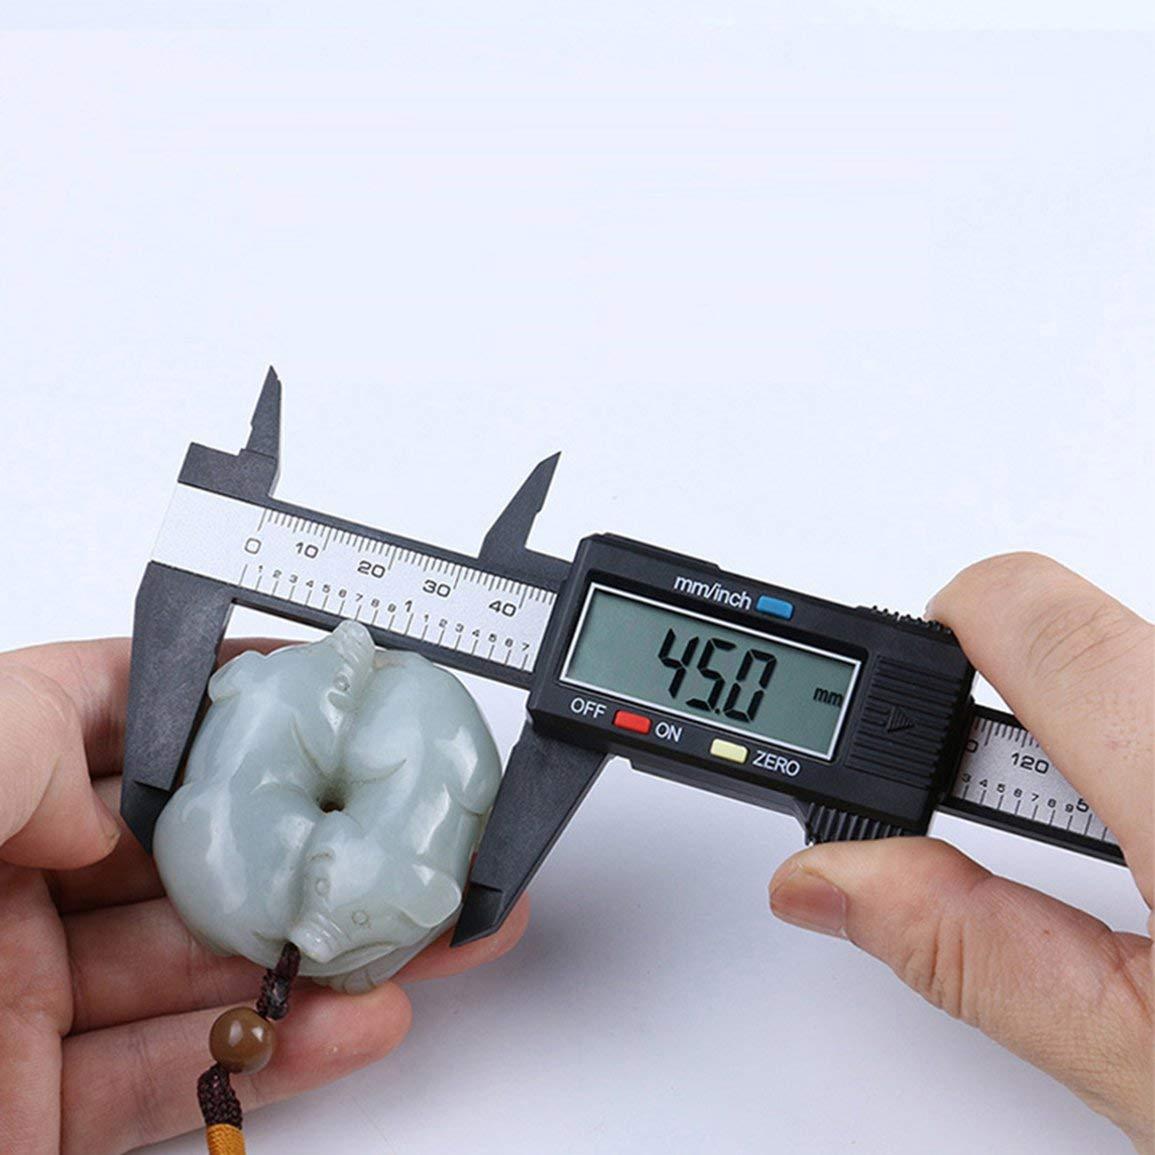 Color:Black/&White Garciakia Electronic Digital Display Vernier Caliper 0-150Mm 0-100Mm Plastic Caliper Measurement Tool Inner Diameter Outer Diameter